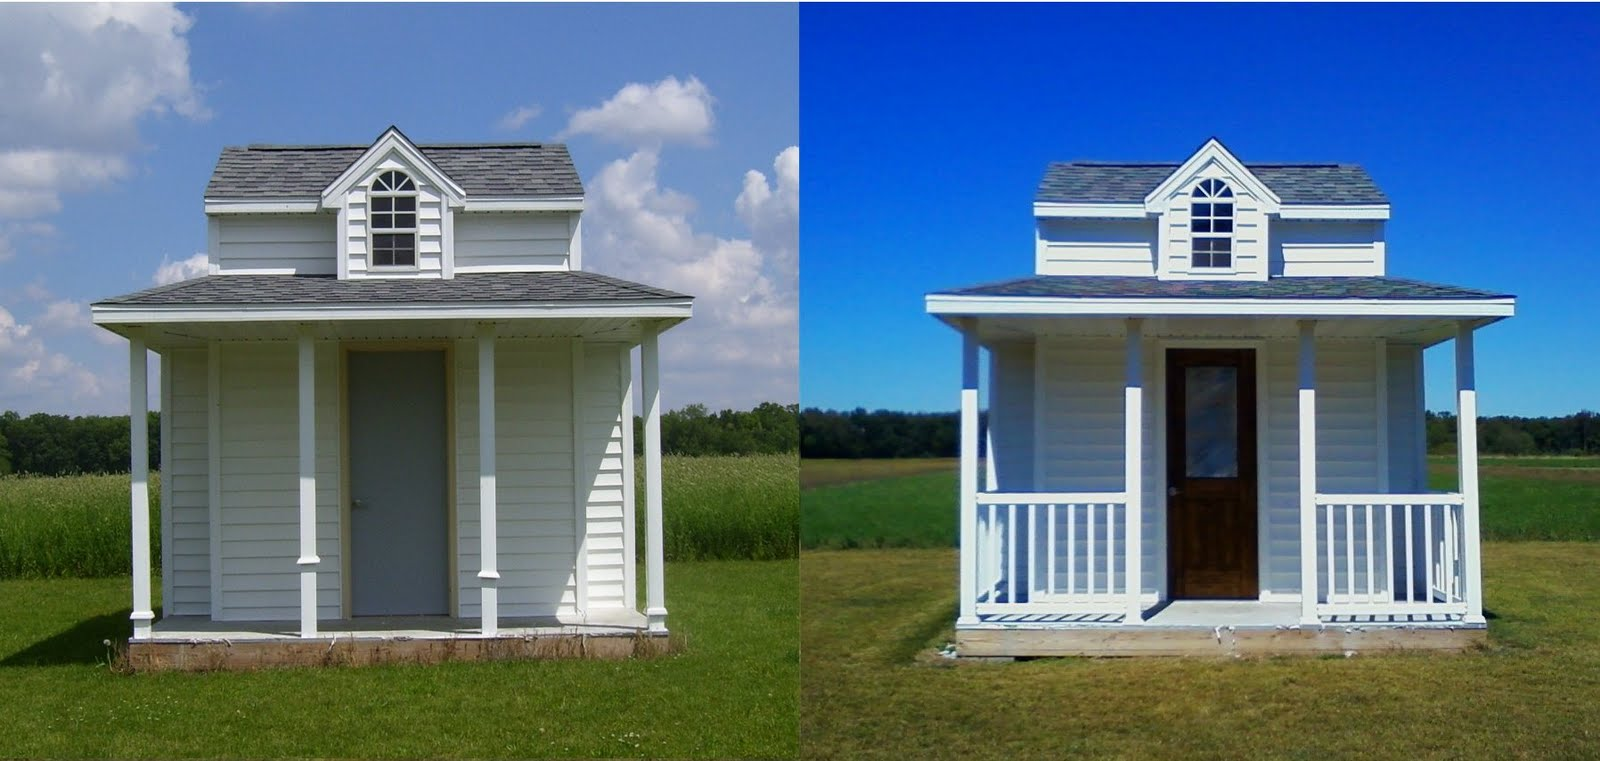 In Rainbow Colors-Paint!: Pool House Door